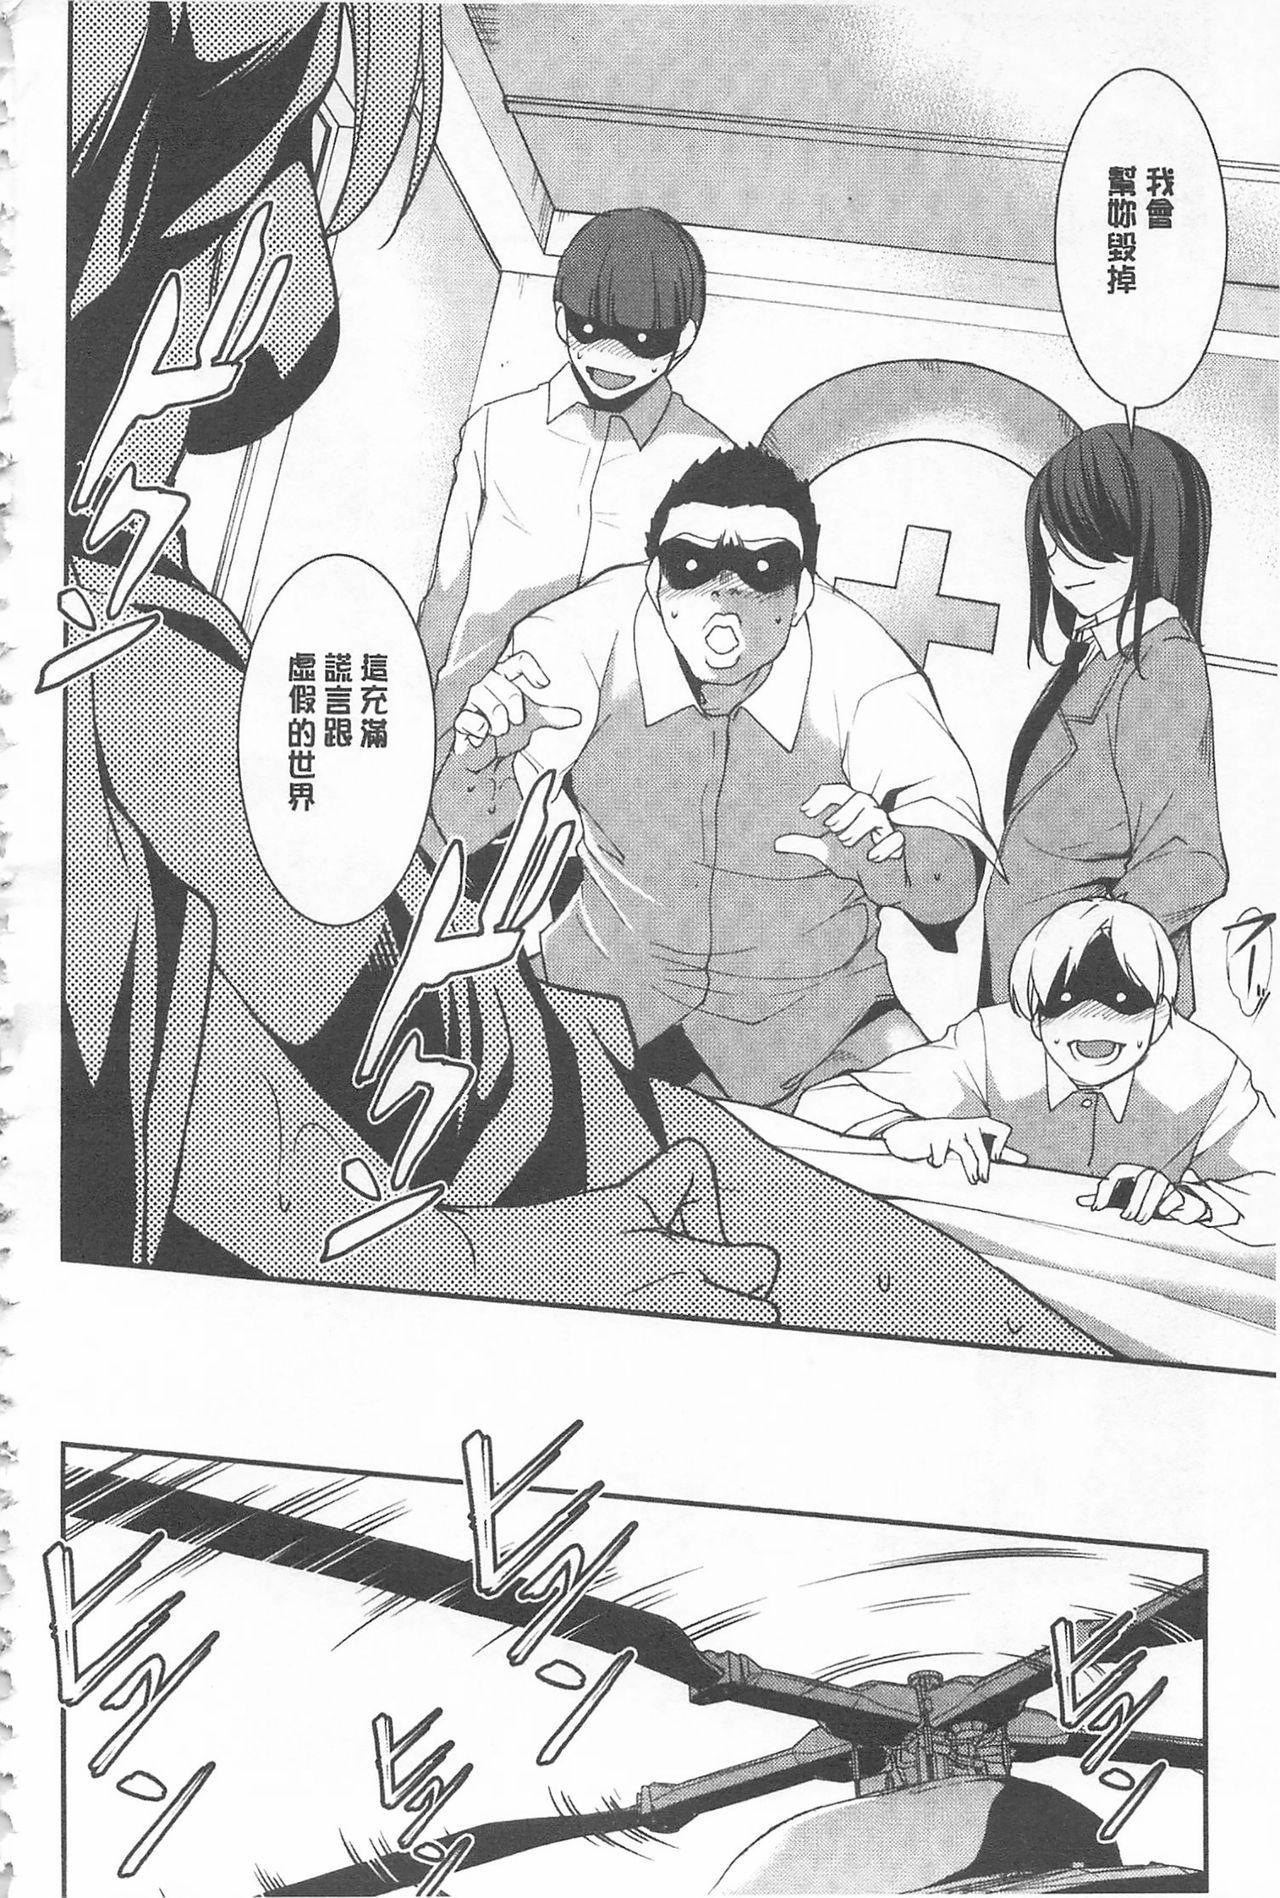 [Amano Kazumi] Seida Inyou -Seijo no Katachi Shita Intou- | 聖墮陰陽 -聖女的容貌與淫蕩- [Chinese] 129